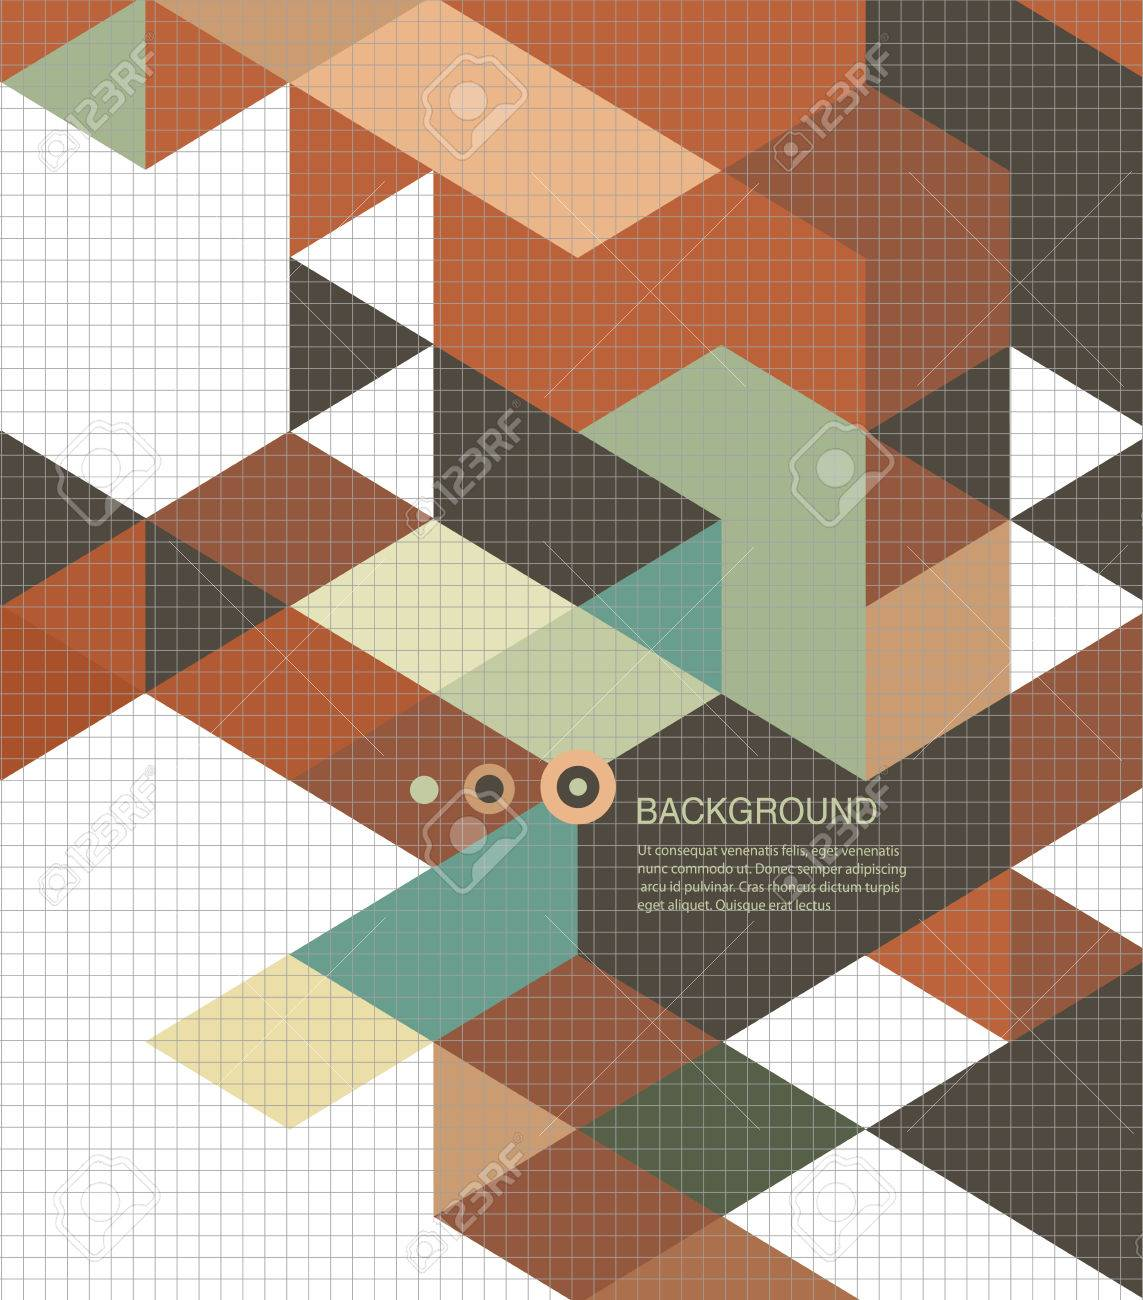 Abstract Book cover Background design/retro mosaic brochure Stock Vector - 23709076